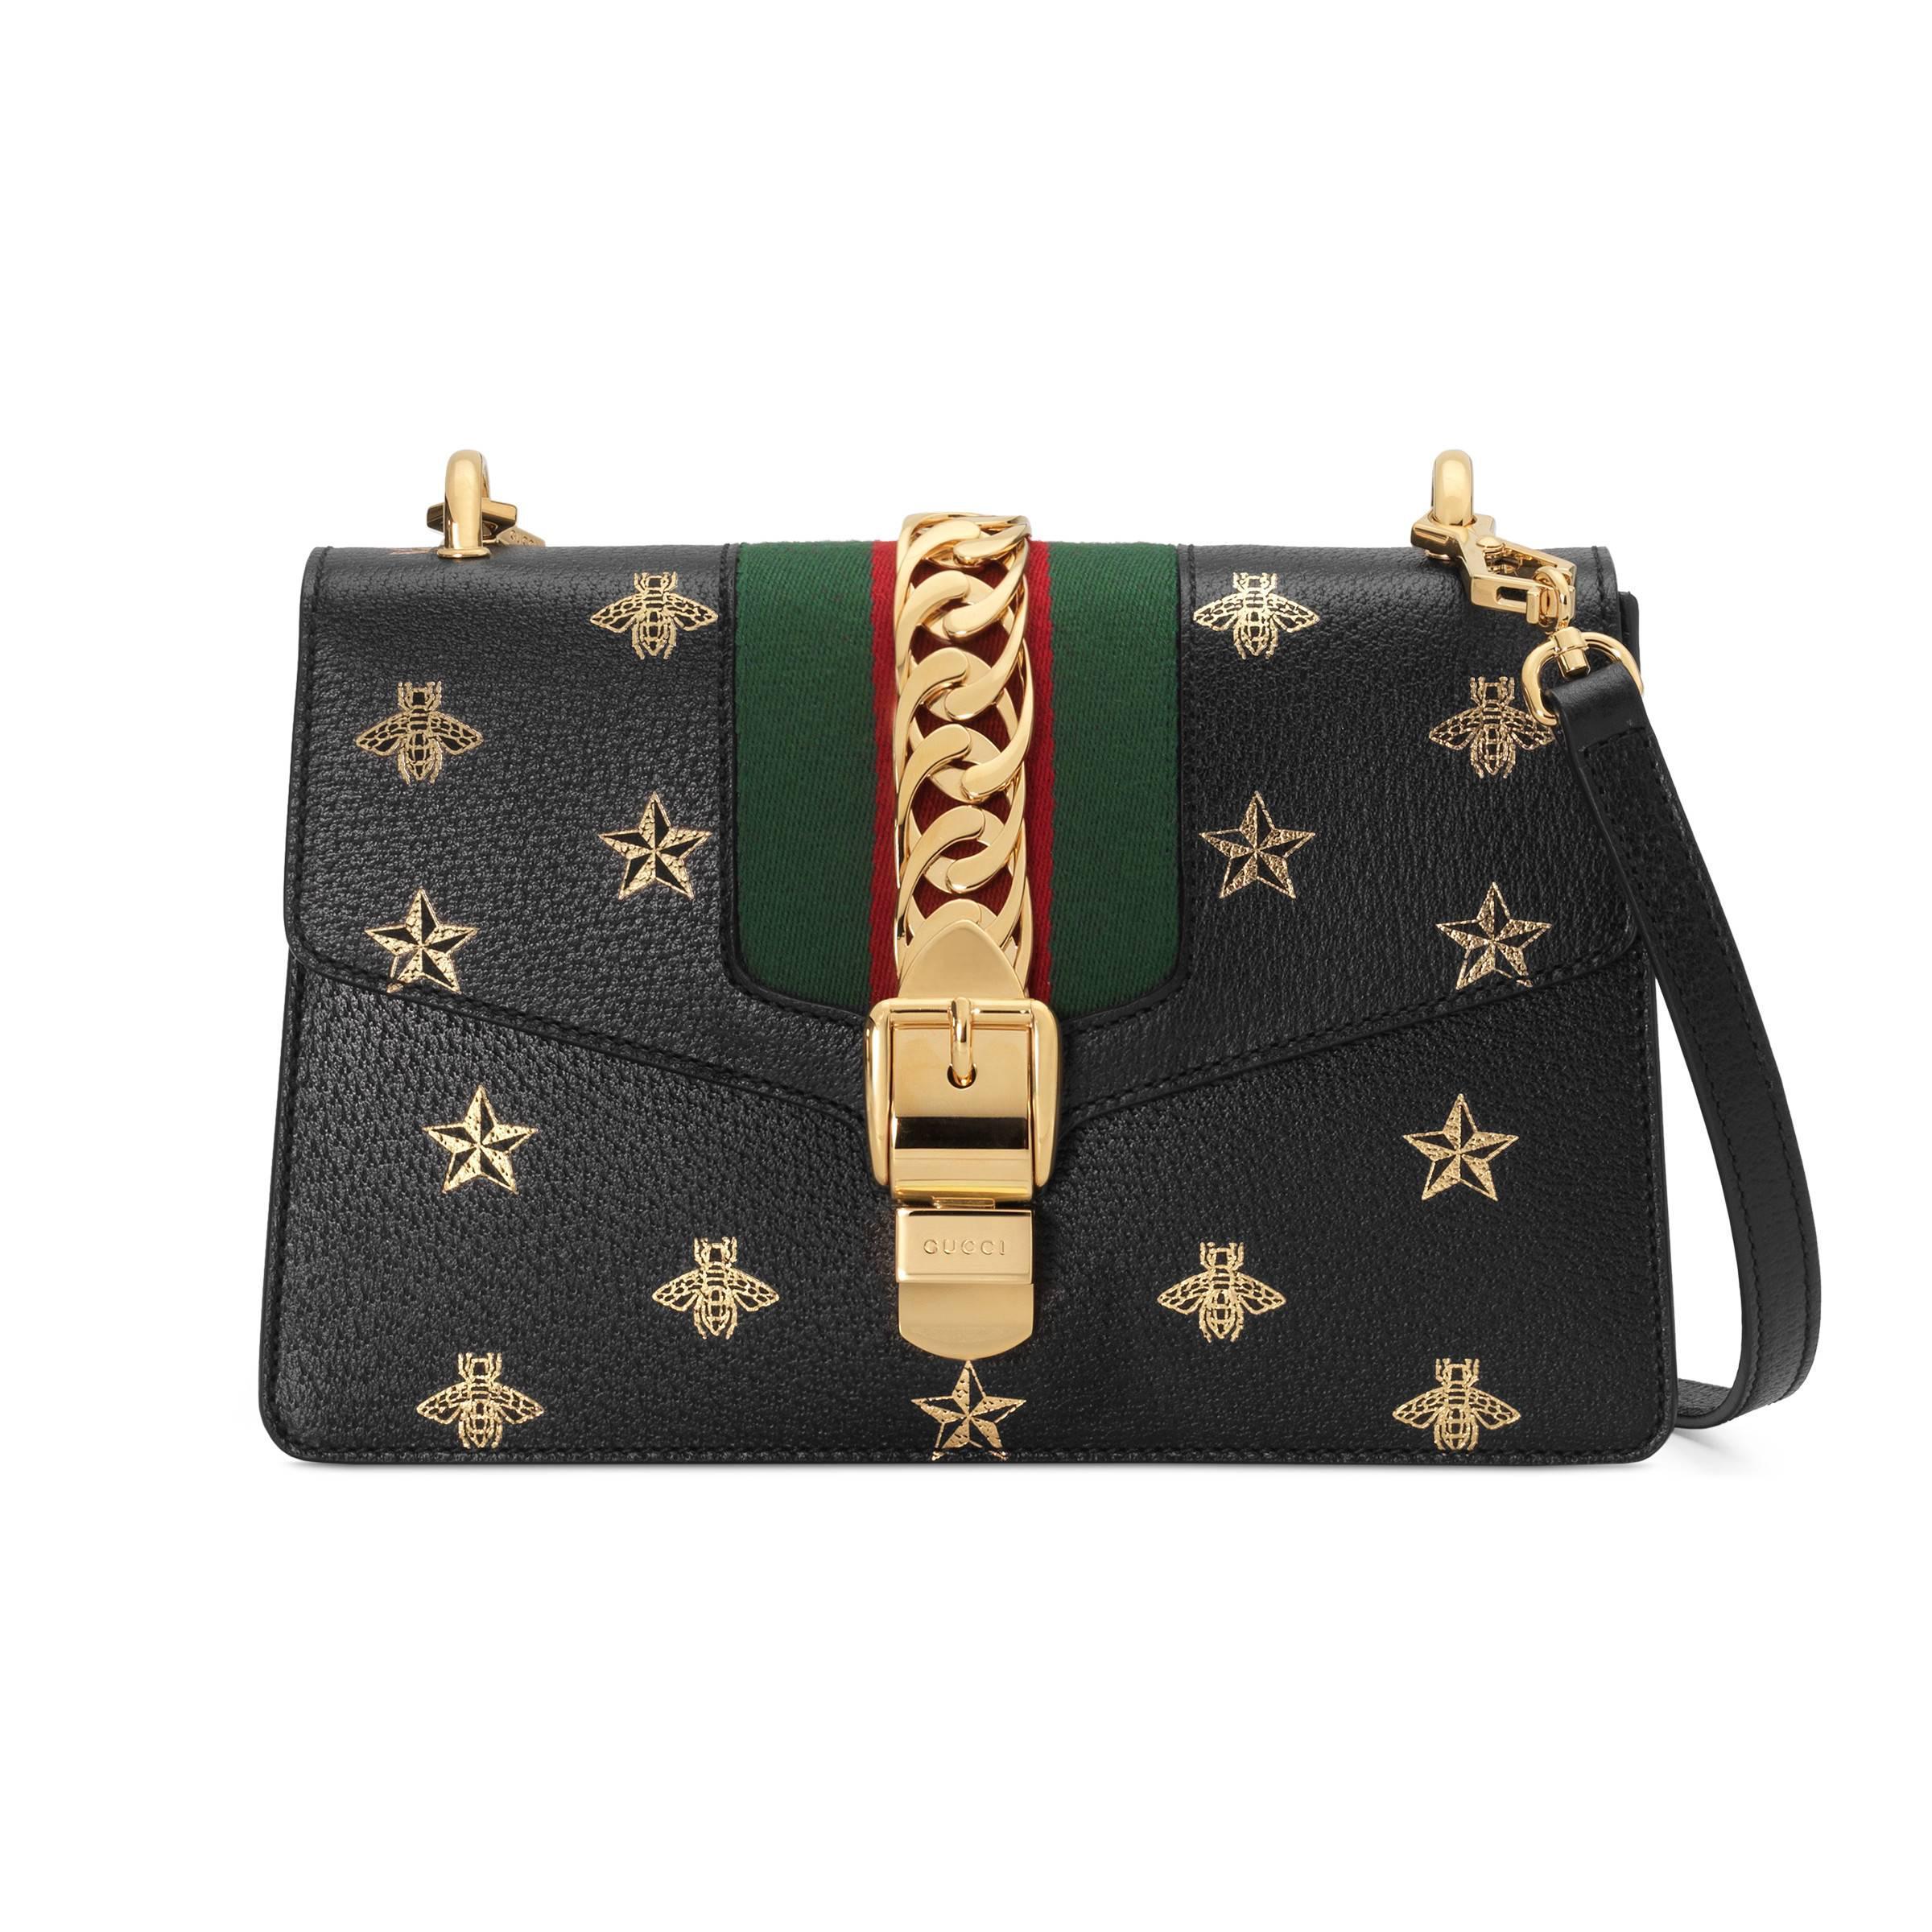 d1a7e67613d Gucci Sylvie Bee Star Small Shoulder Bag in Black - Lyst